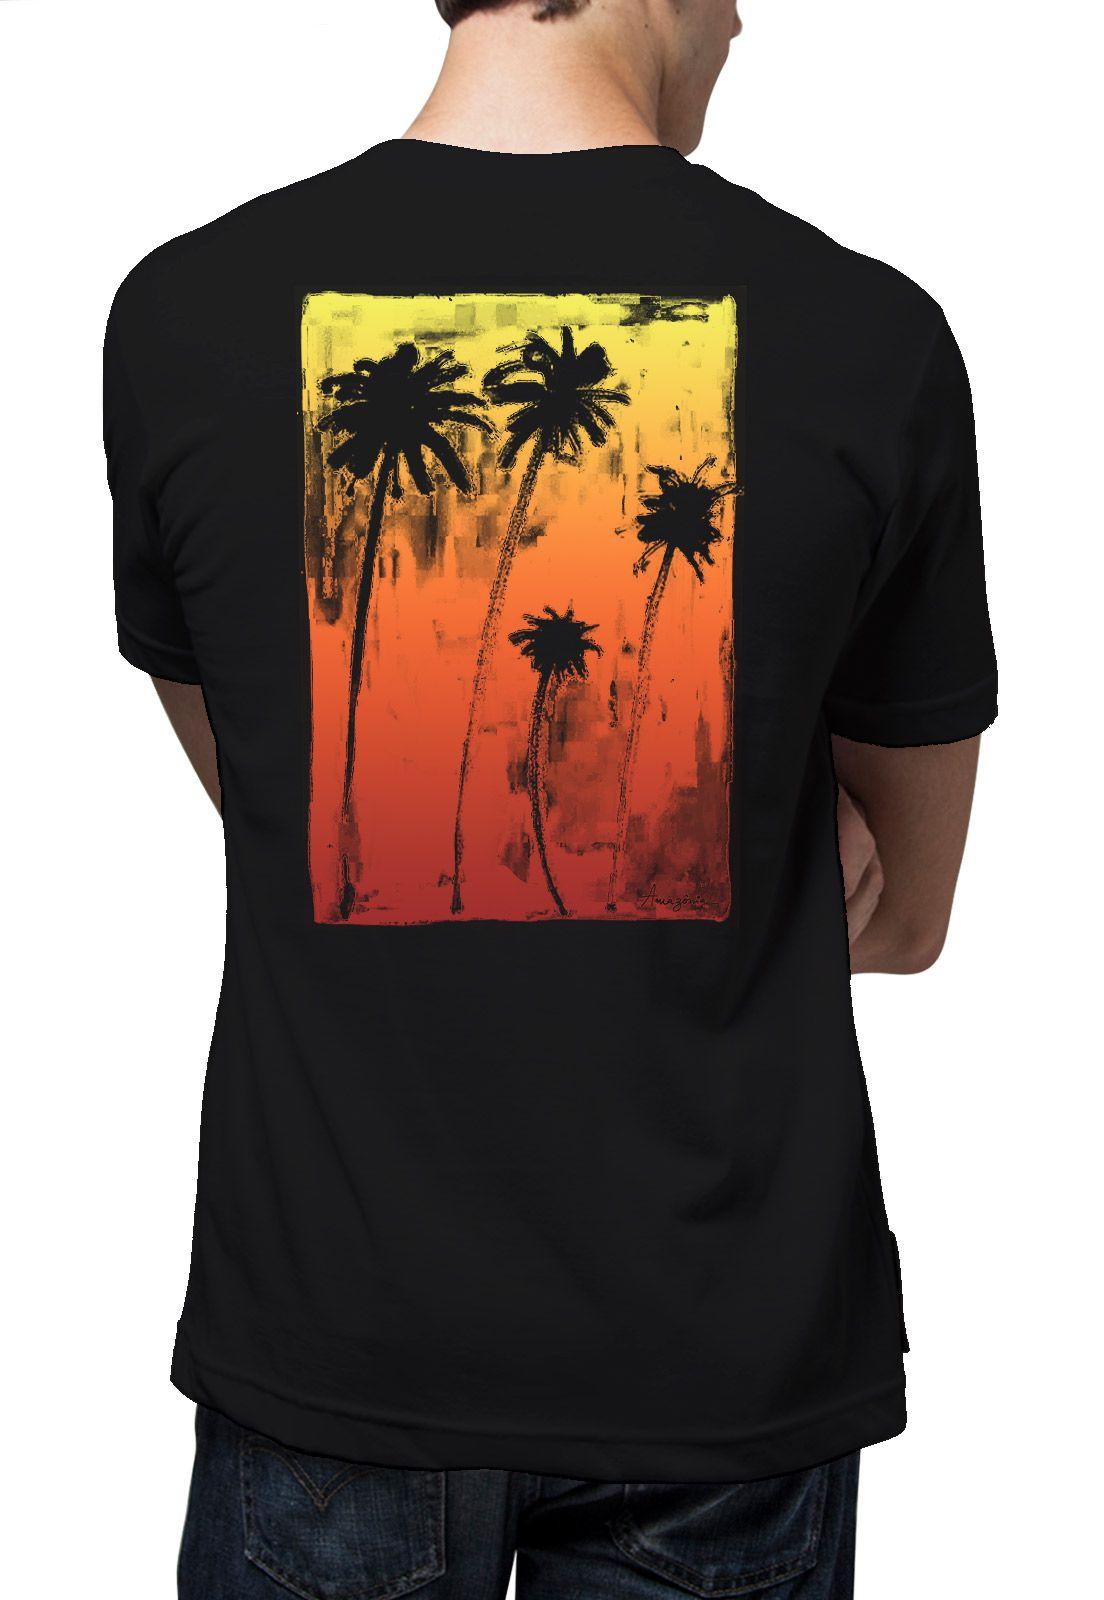 Camiseta Amazônia Praia da Bahia - Preto